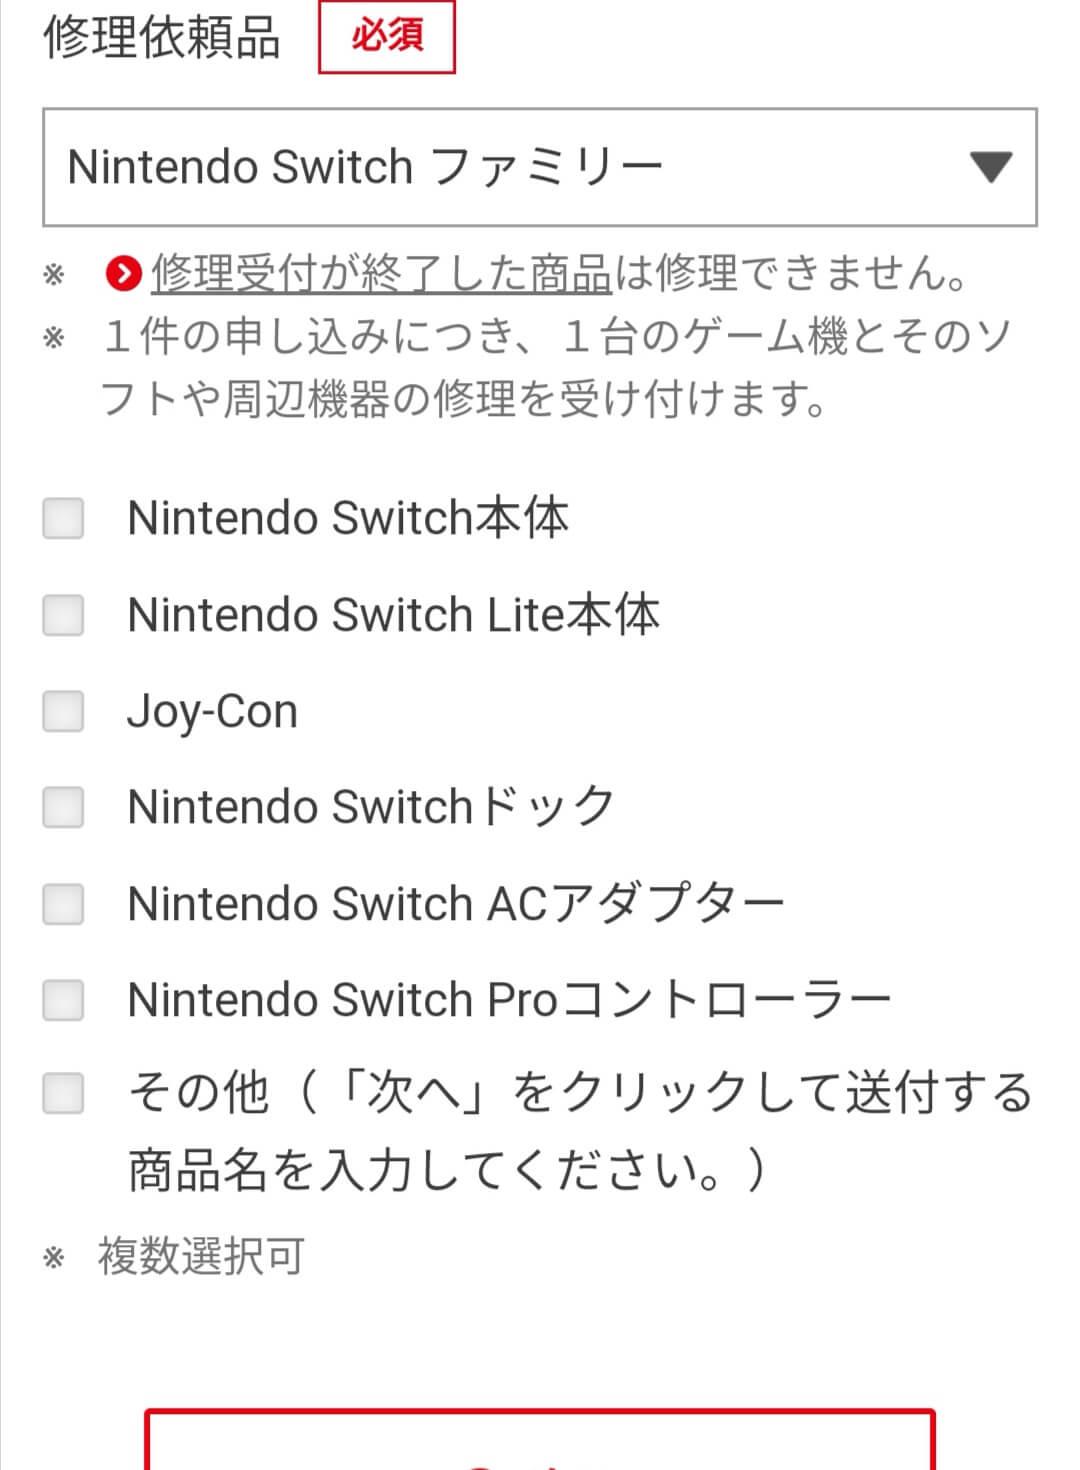 SwitchLite修理申し込み体験記/修理依頼品の選択